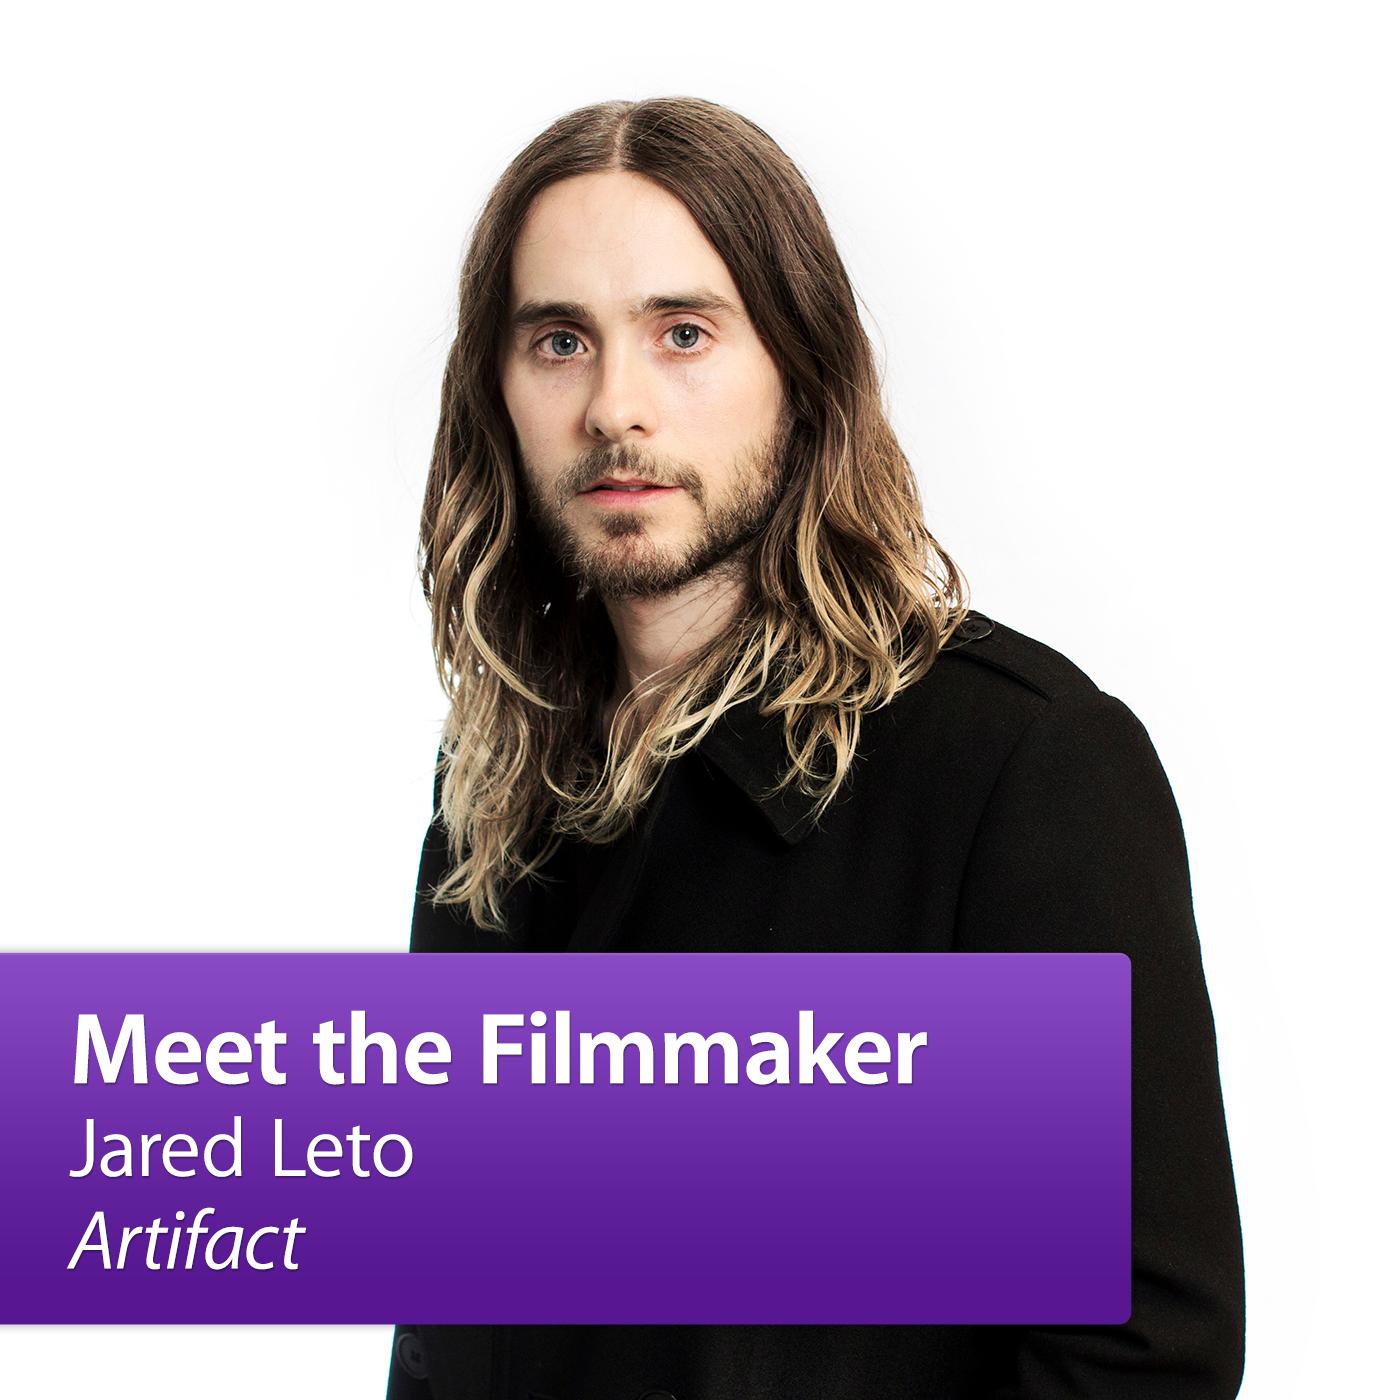 Jared Leto: Meet the Filmmaker